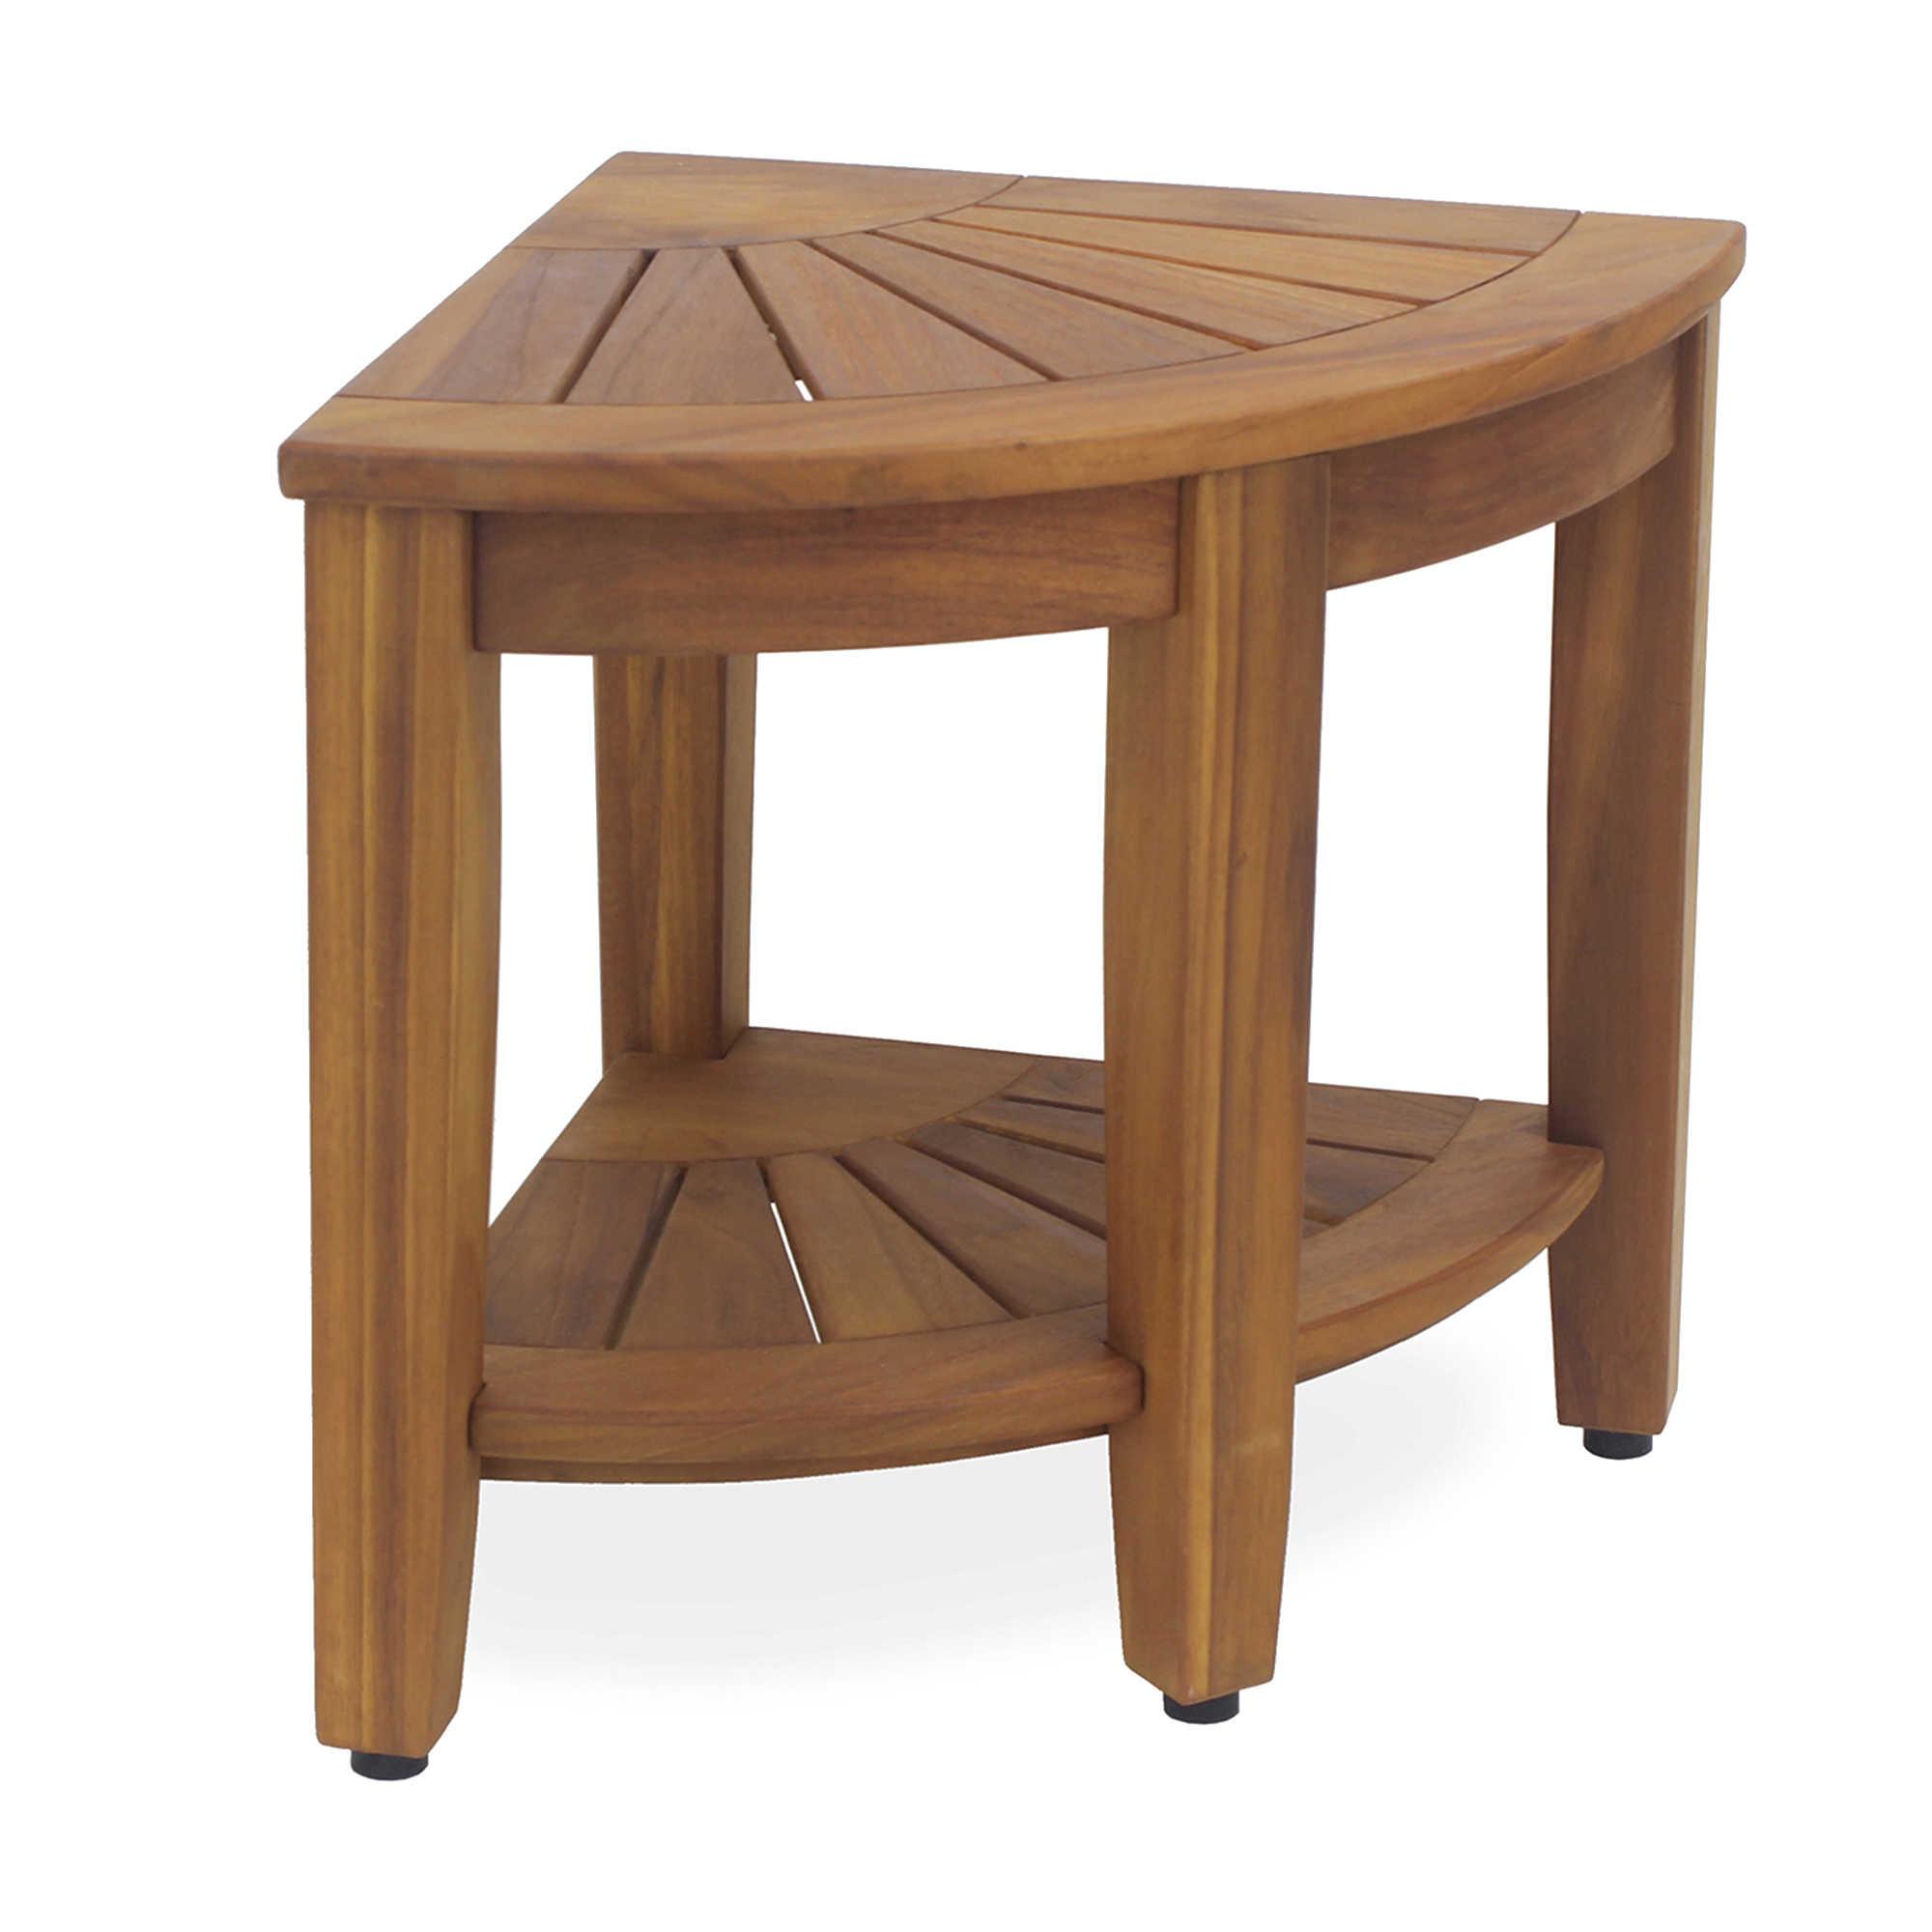 storage  shower benches  bathroom vanity sets  stools  - image of solid teak corner vanity stool